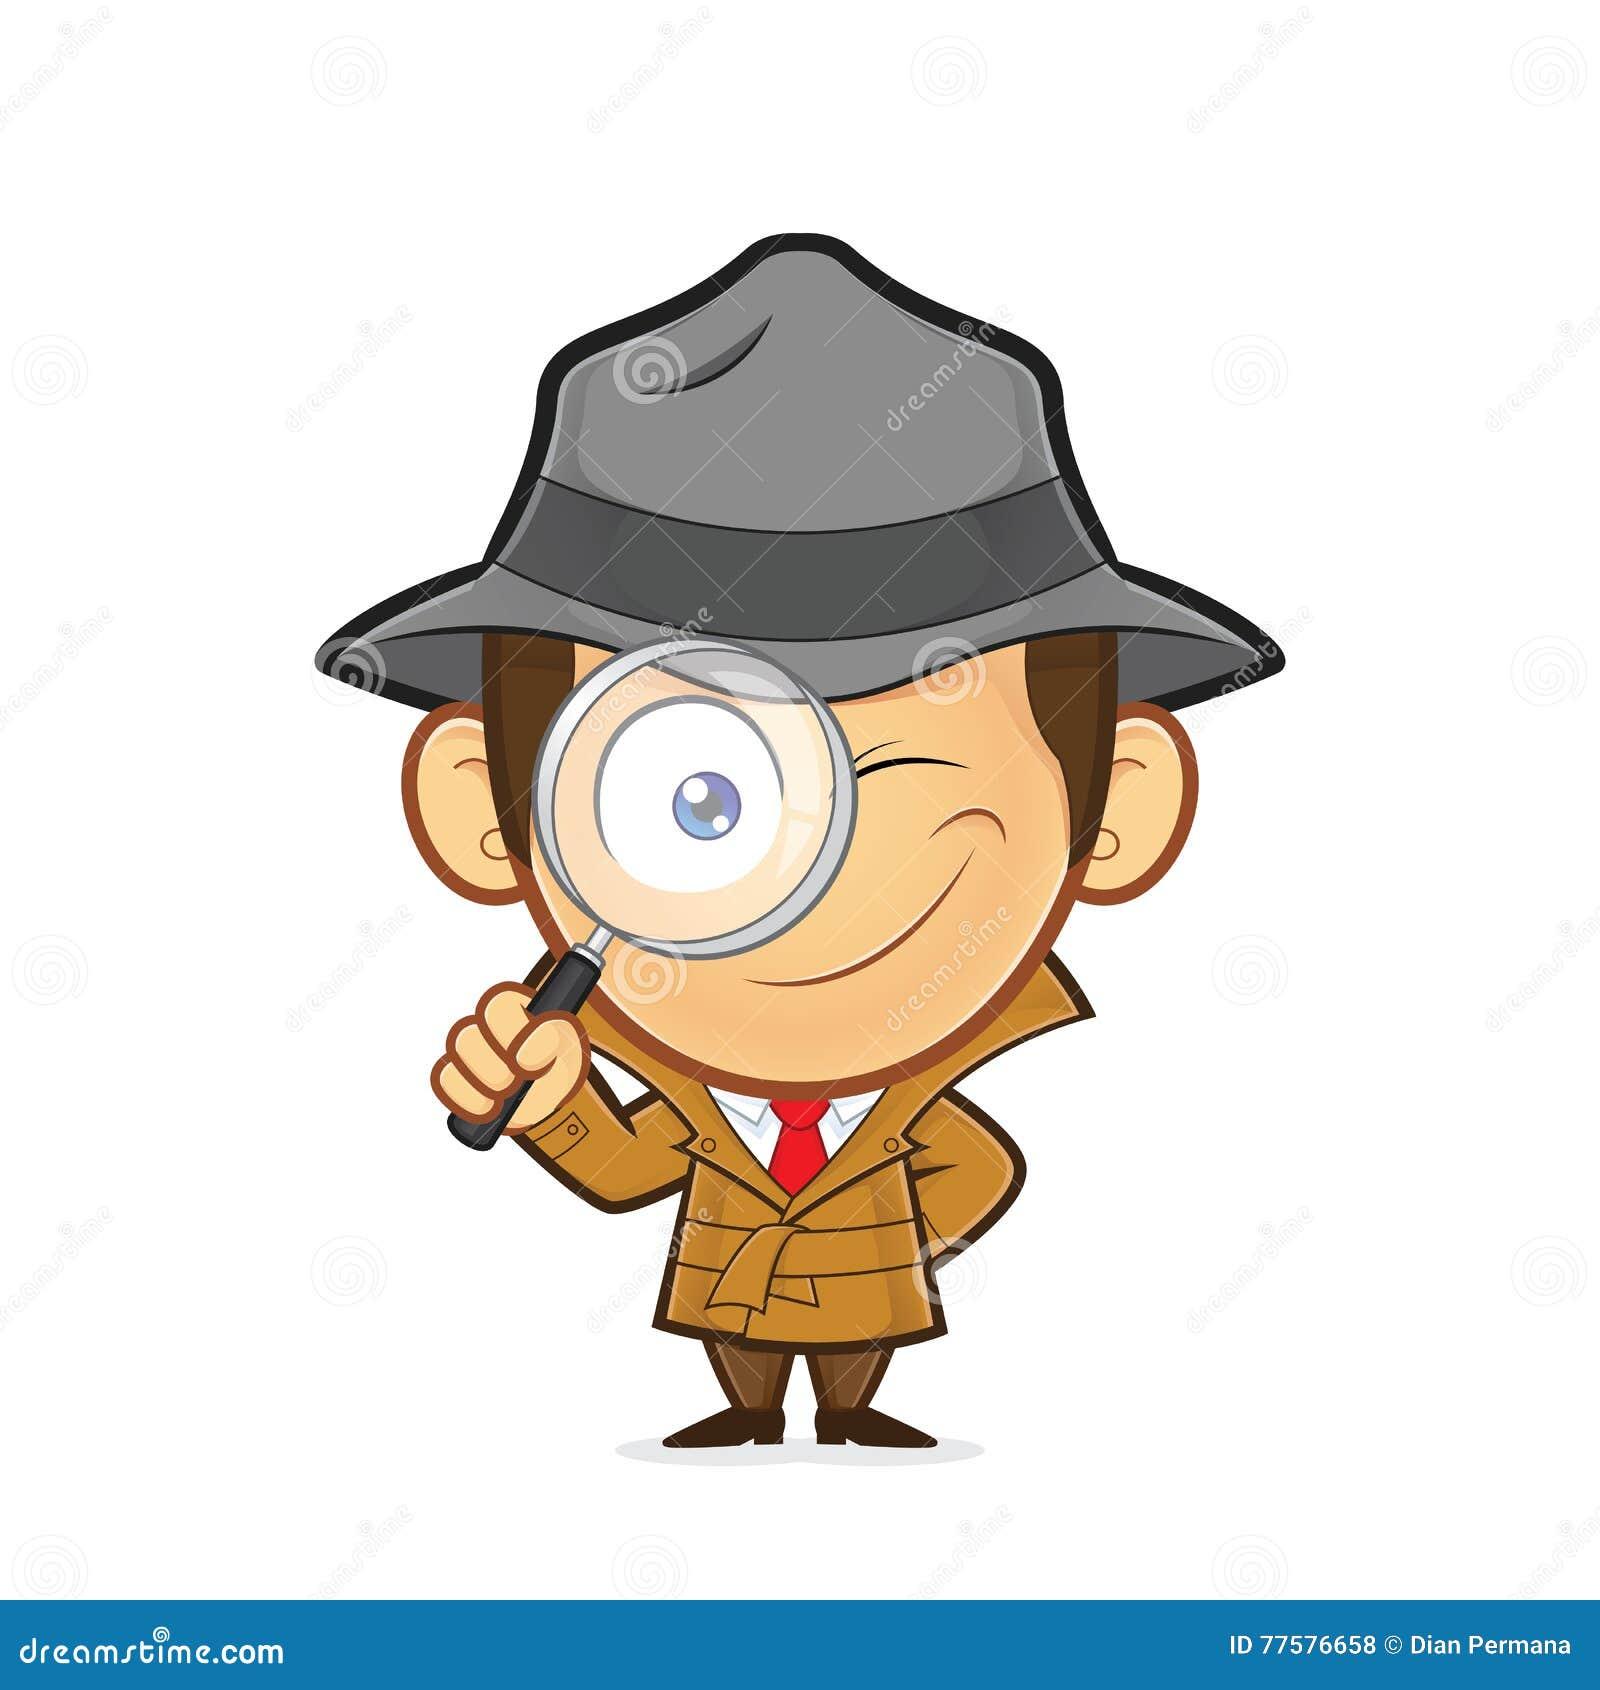 Que piensas en este momento - Página 2 Detective-holding-magnifying-glass-clipart-picture-cartoon-character-77576658